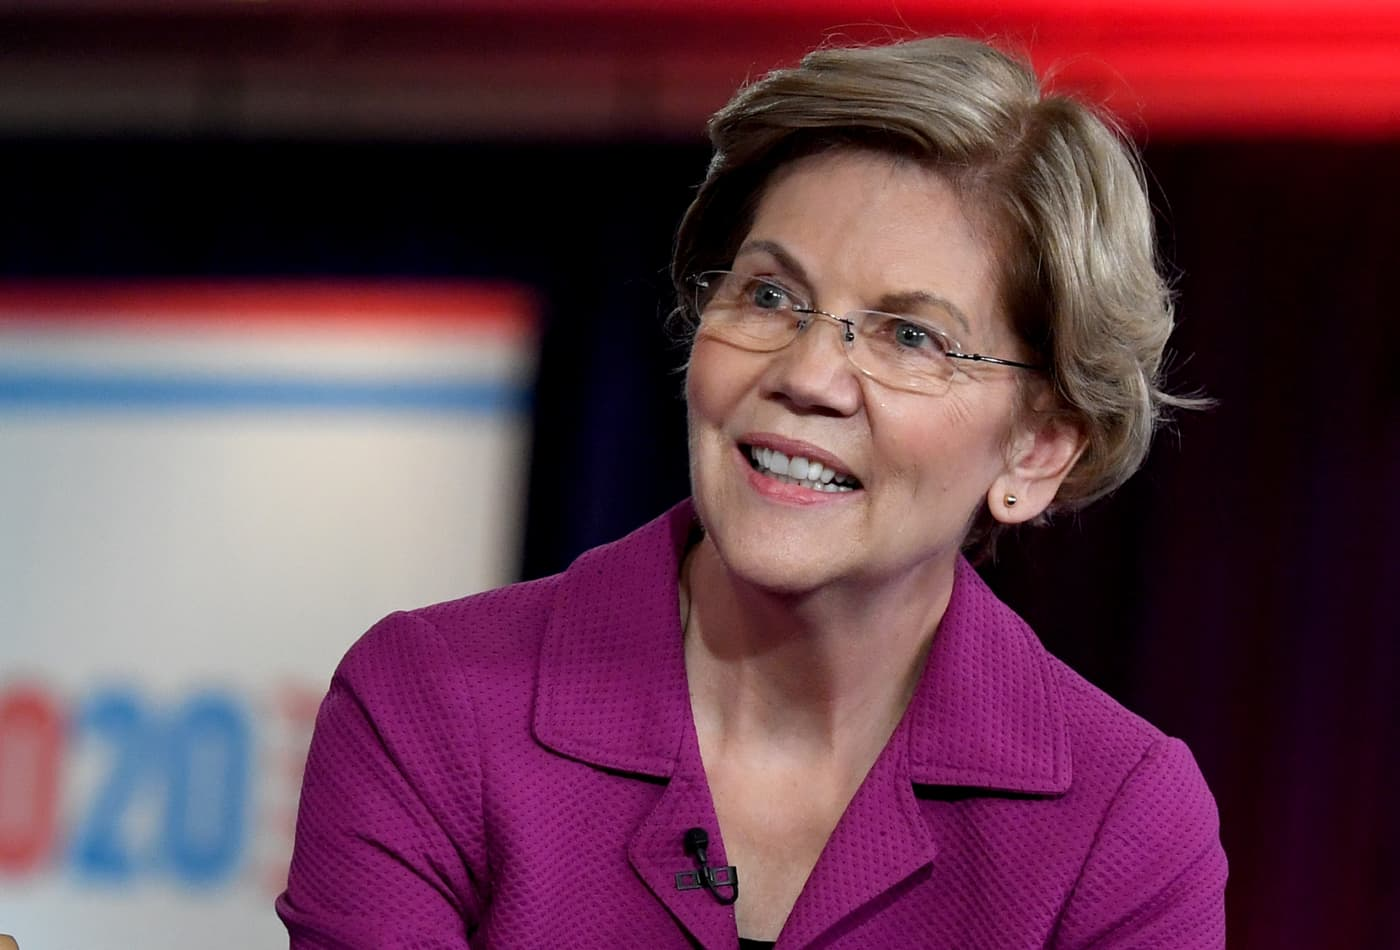 Elizabeth Warren buys full-page ad slamming Sheldon Adelson in his own newspaper day after debate